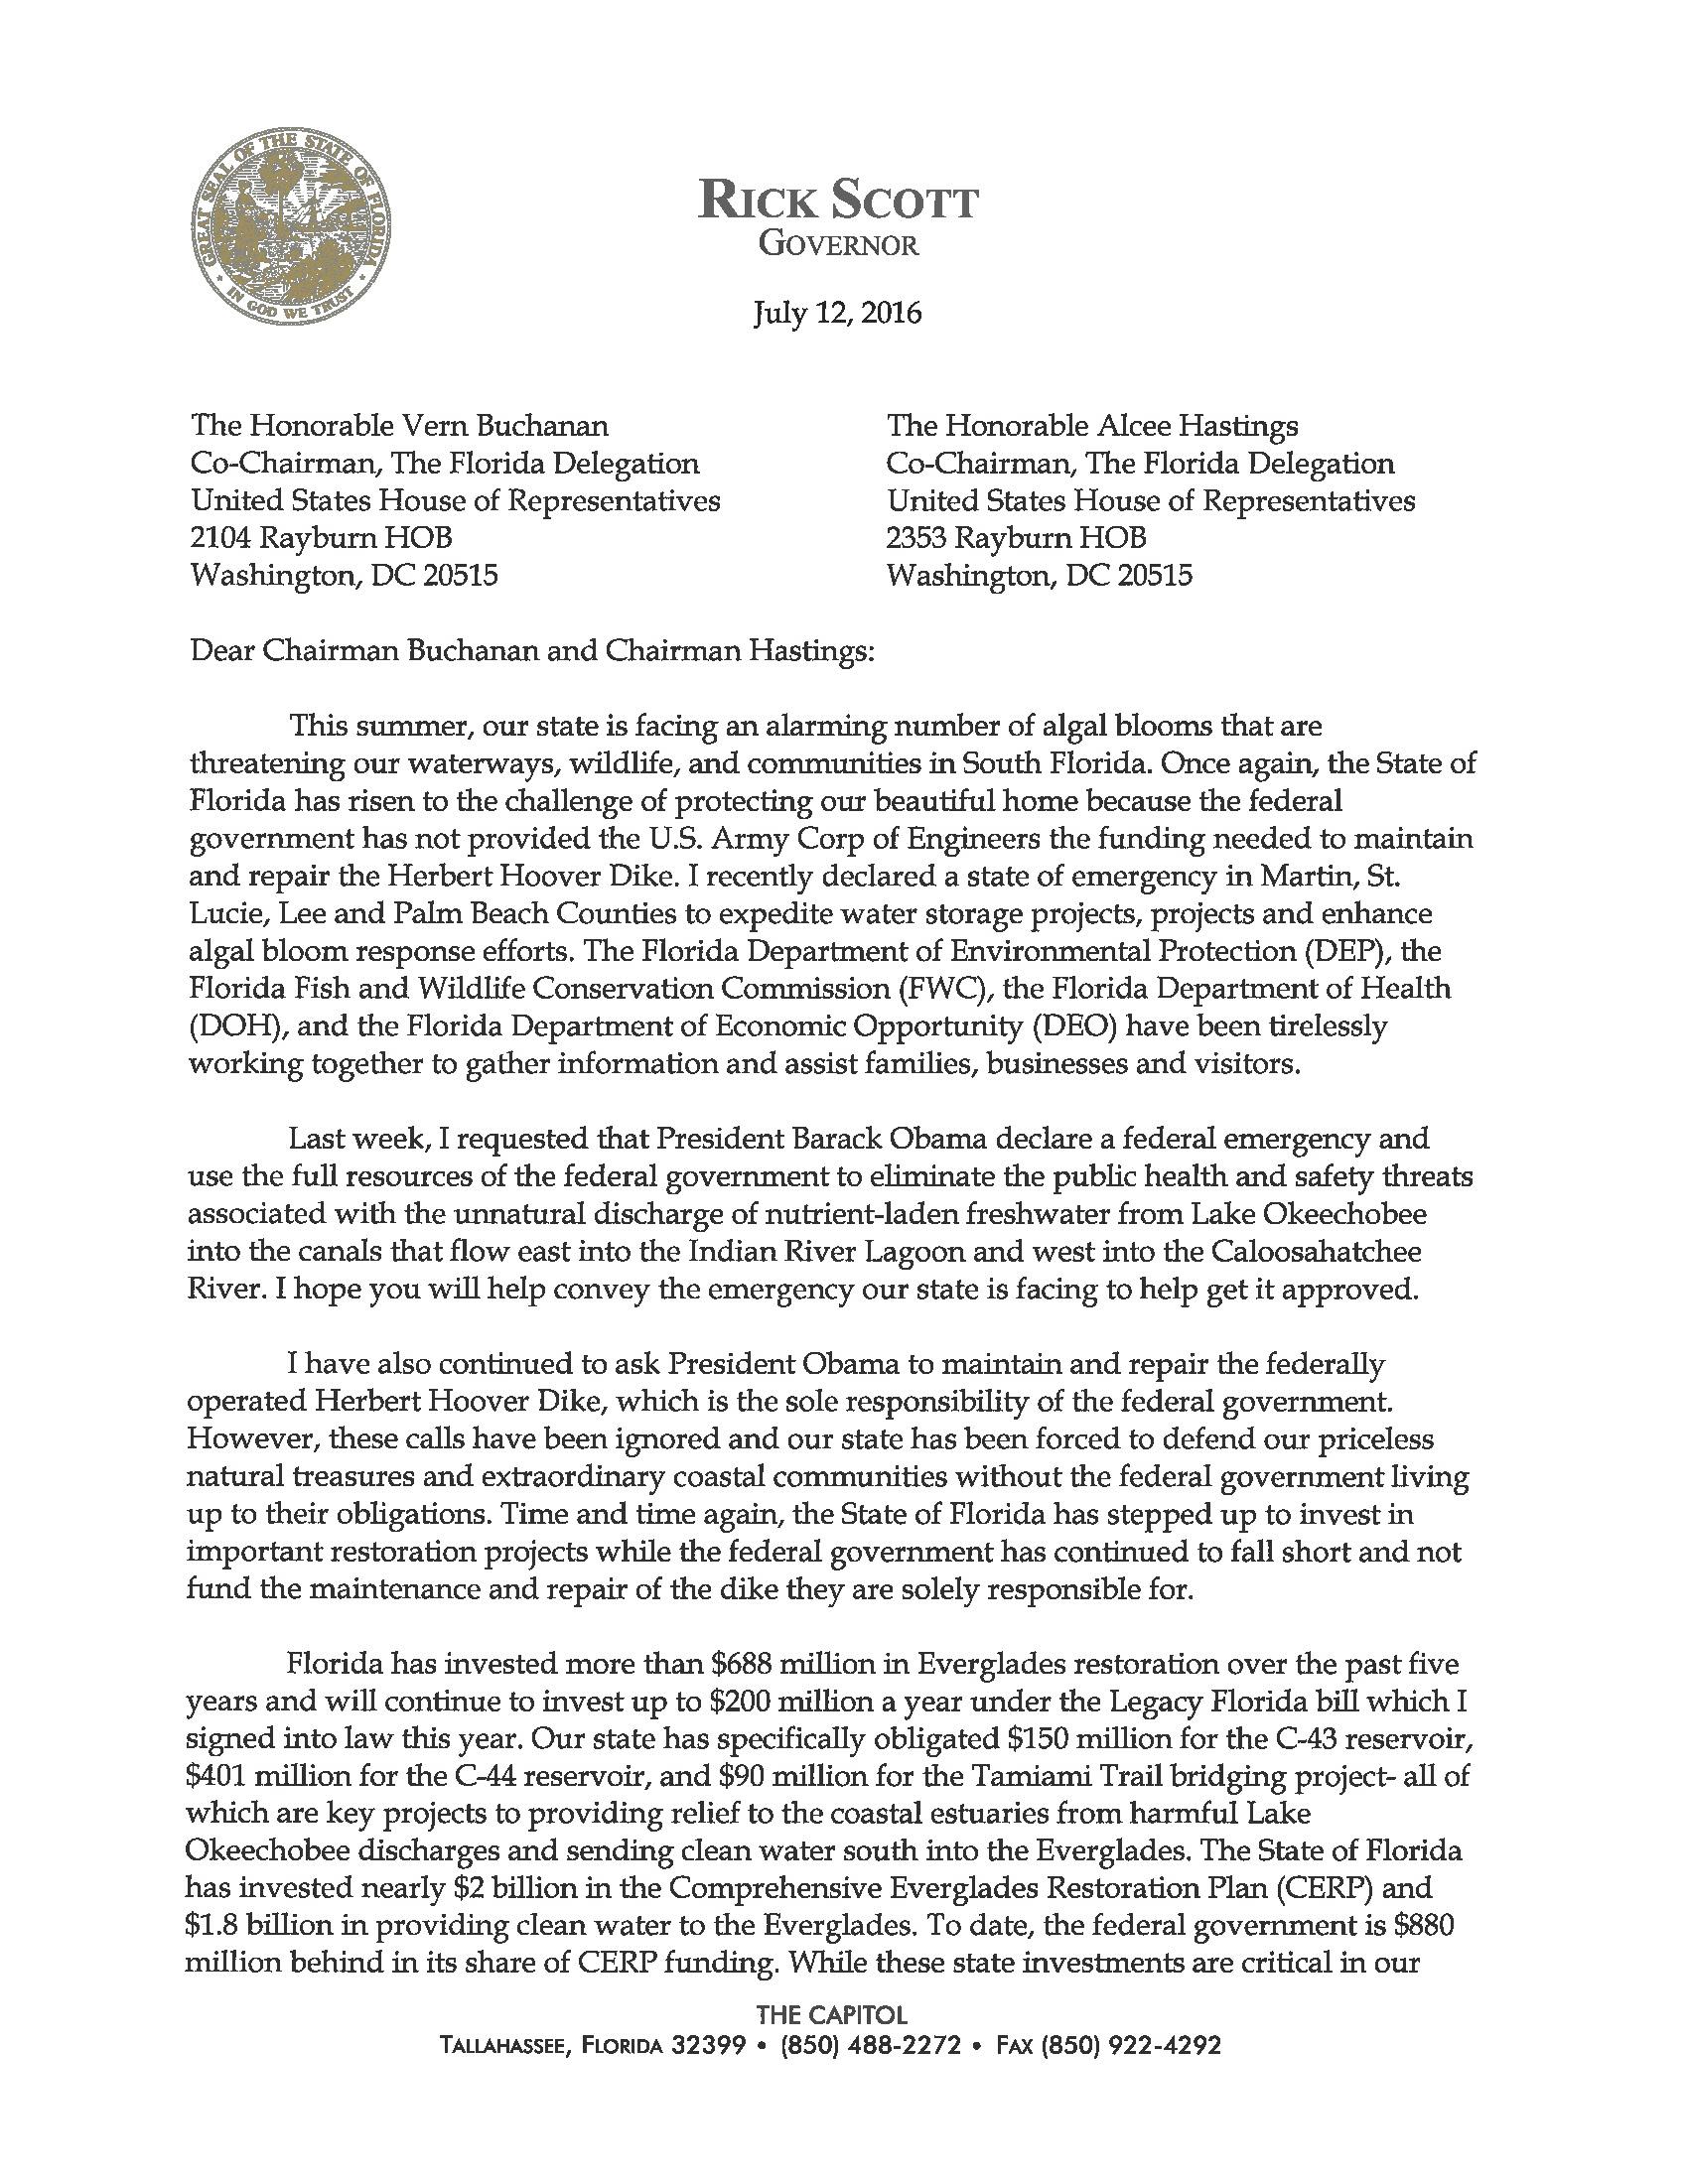 Gov. Scott Letter to Congressional Delegation_Page_1